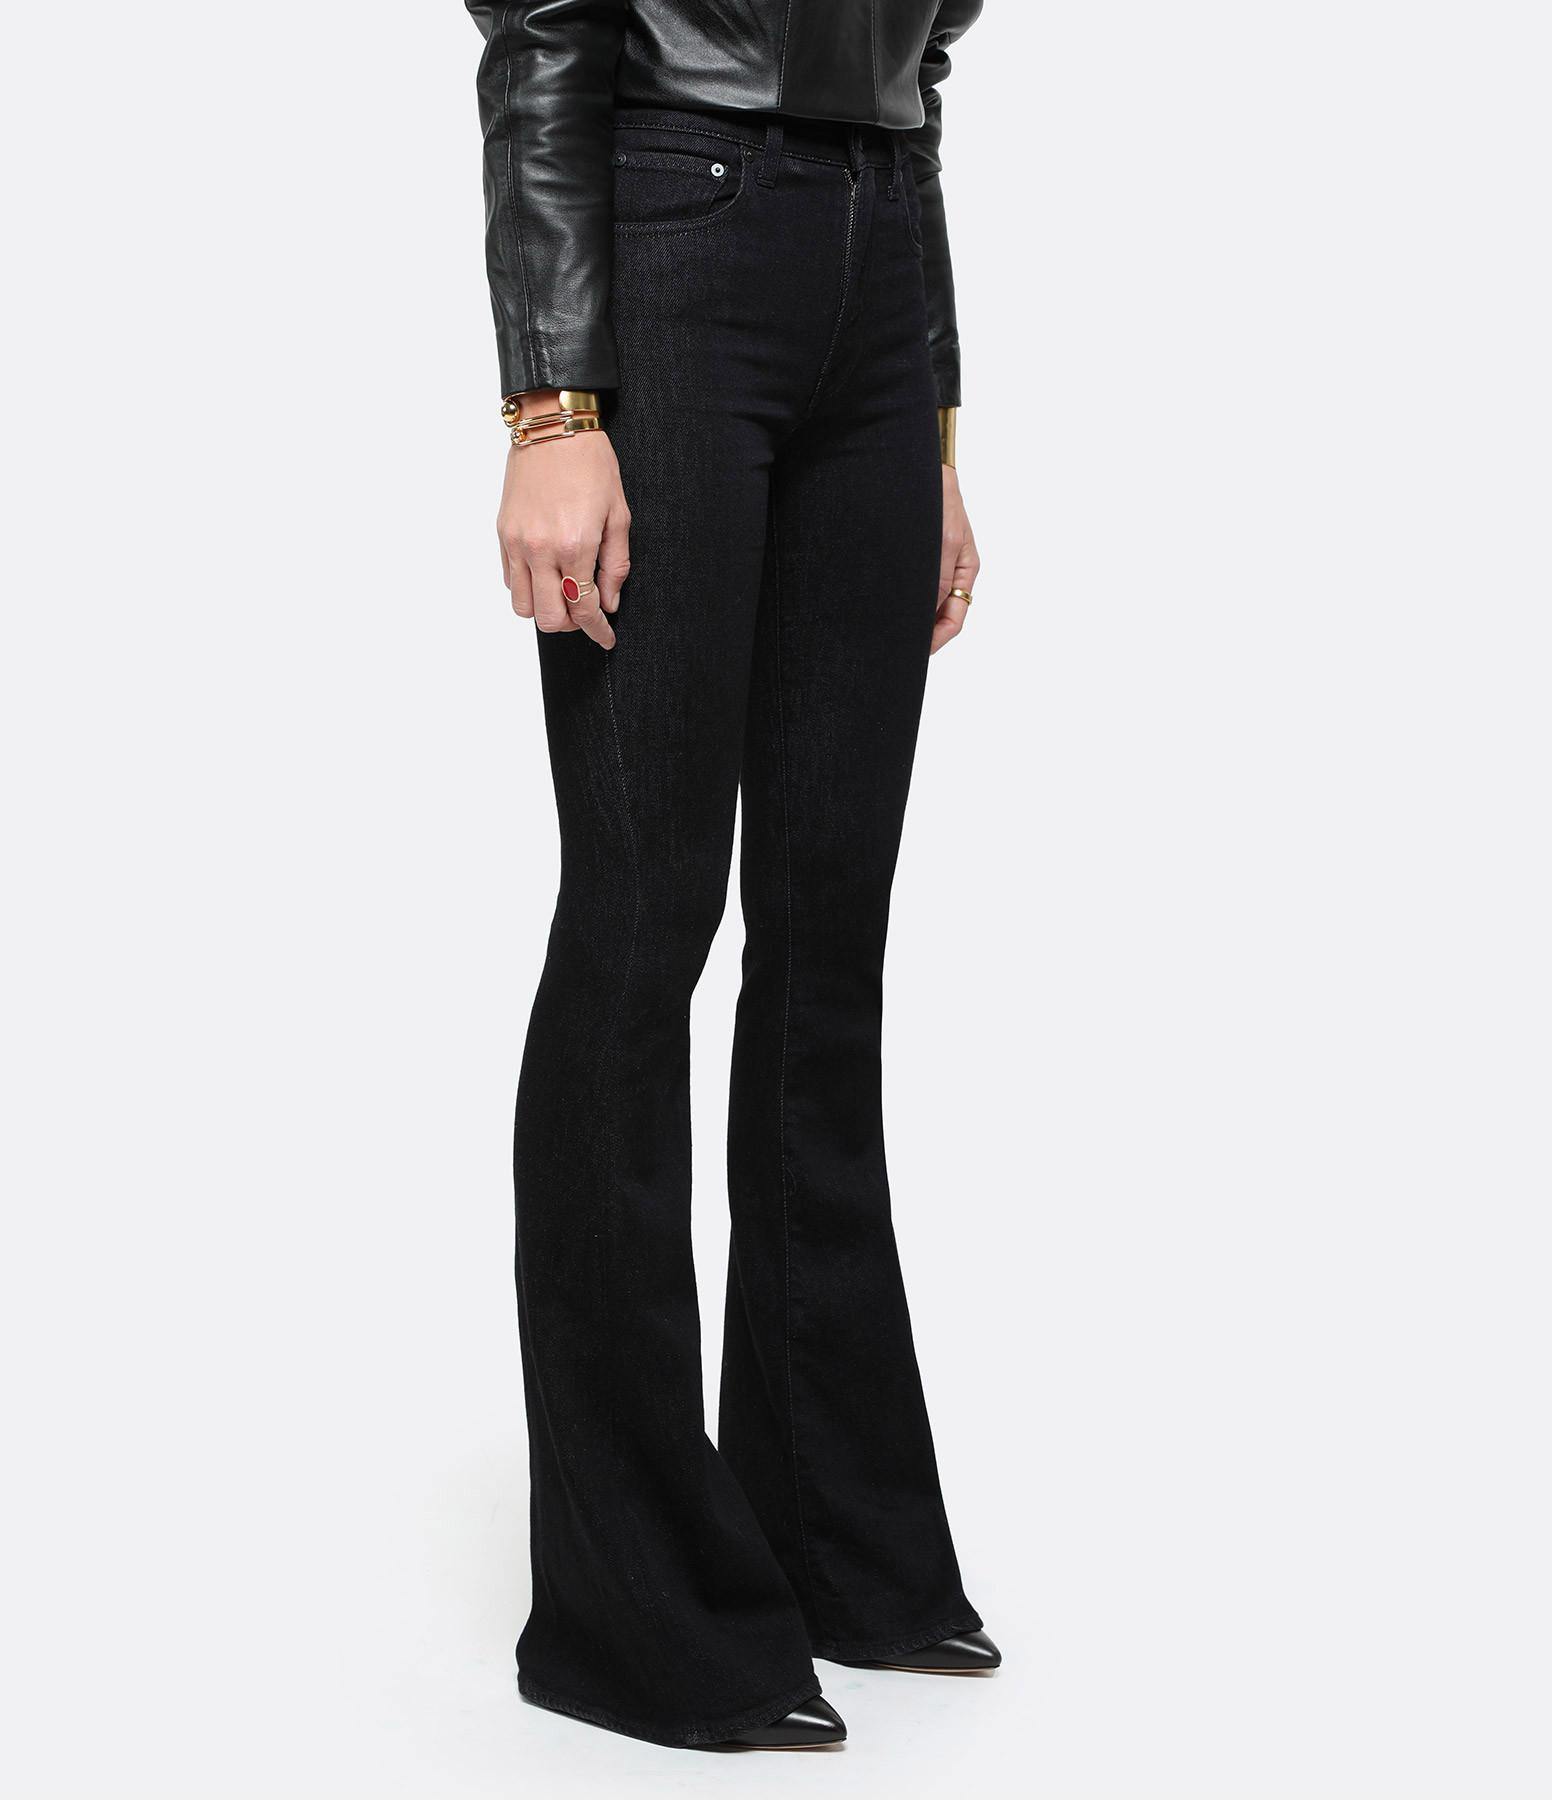 MADE IN TOMBOY - Pantalon Ursula Denim Noir